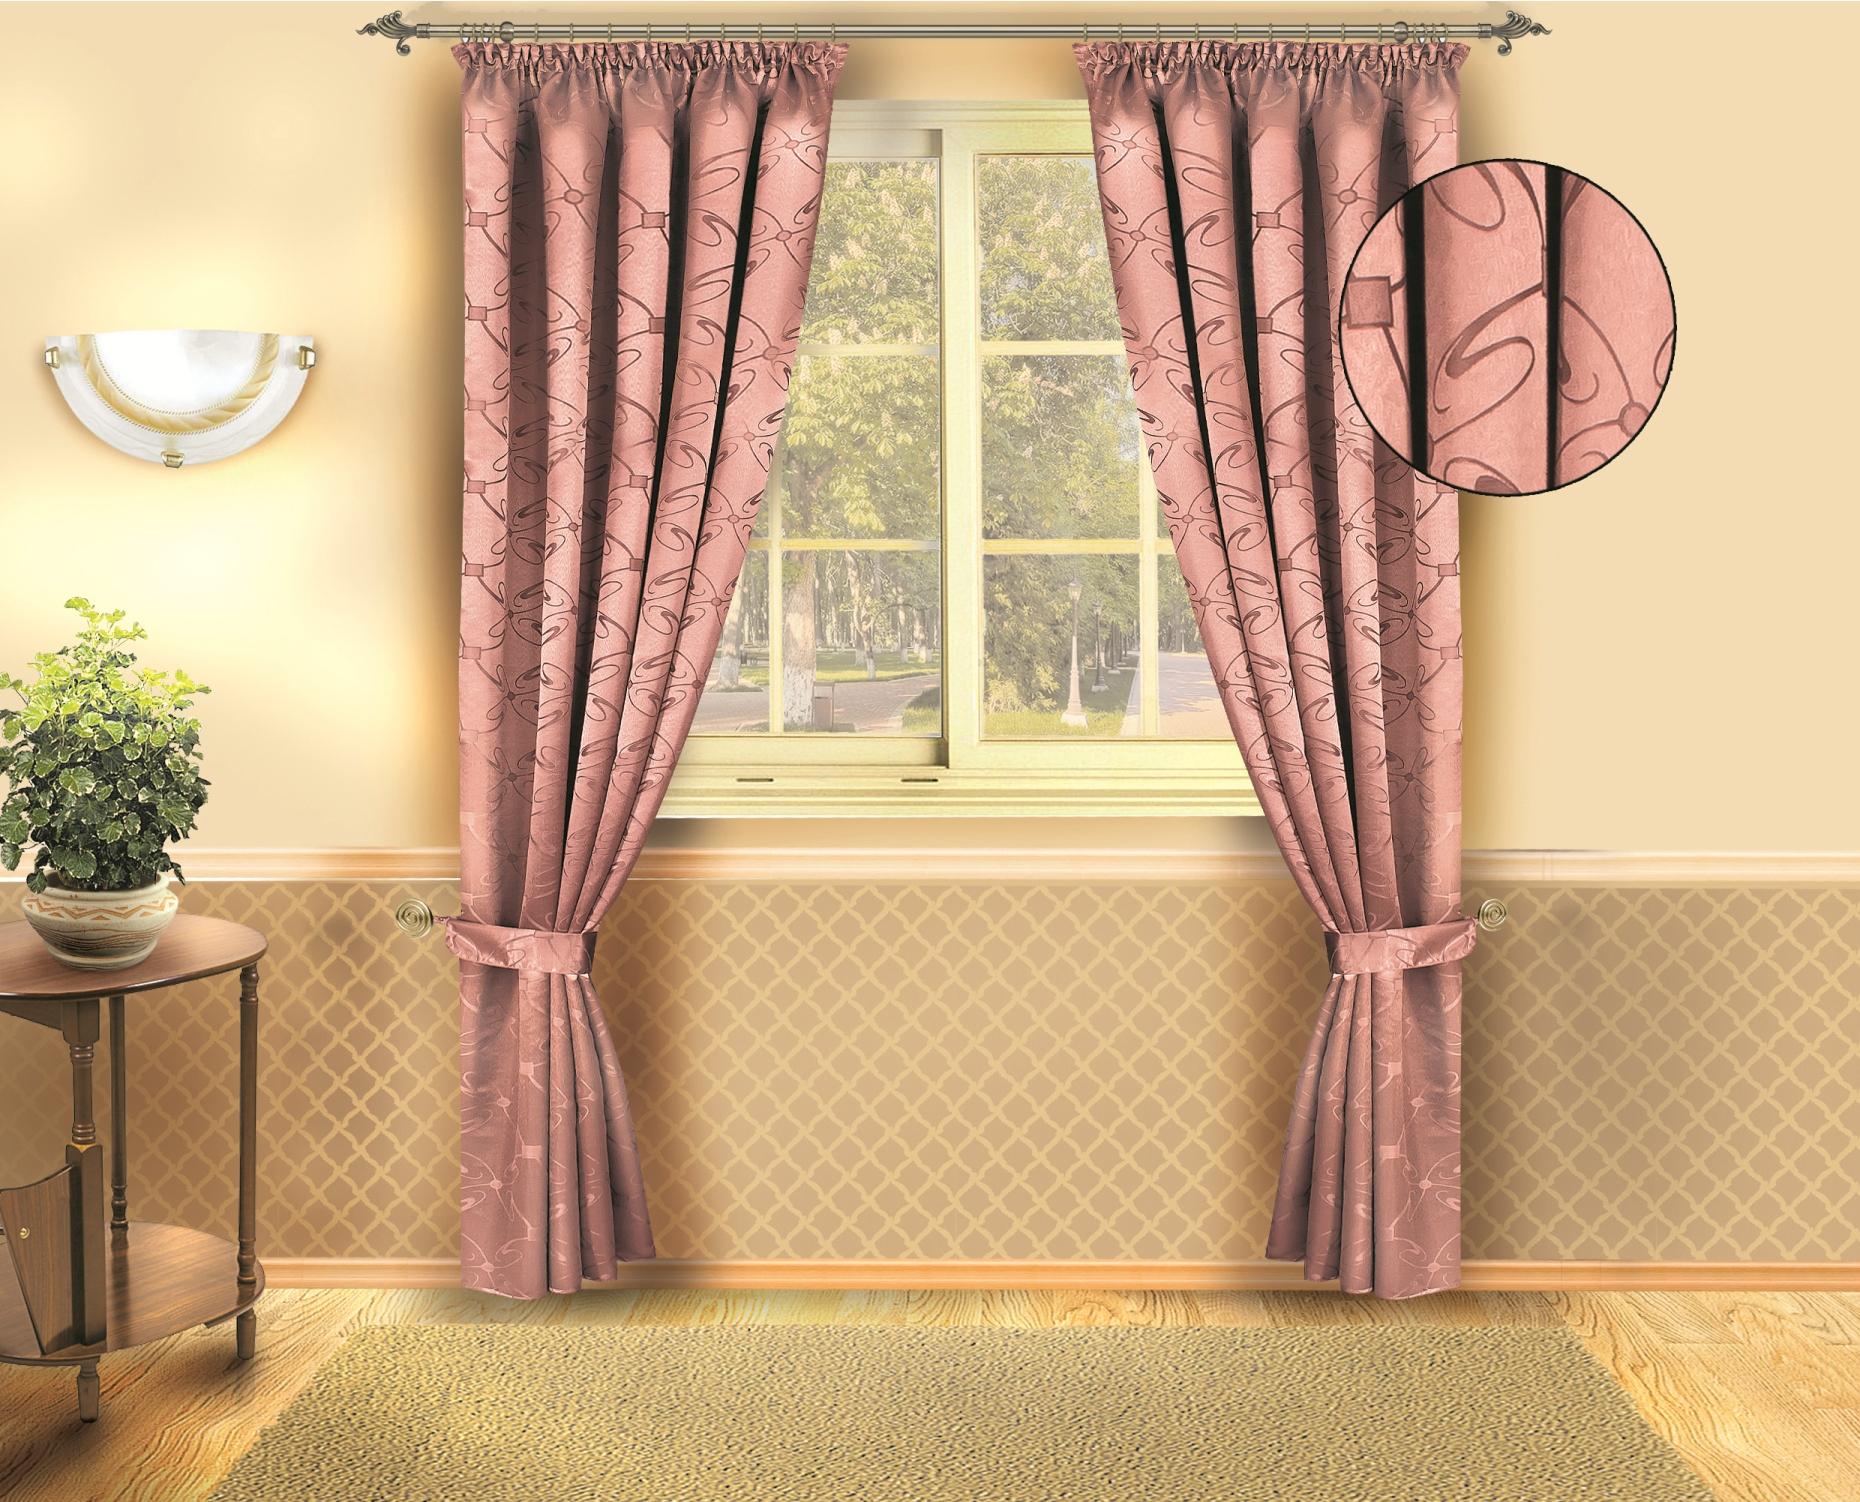 Комплект штор Zlata Korunka 140*250*2. Б133 розовыйБ133 розовыйКомплект штор Zlata Korunka 140*250*2. Б133 розовый Материал: 100% п/э, размер: 140*250*2, цвет: розовый